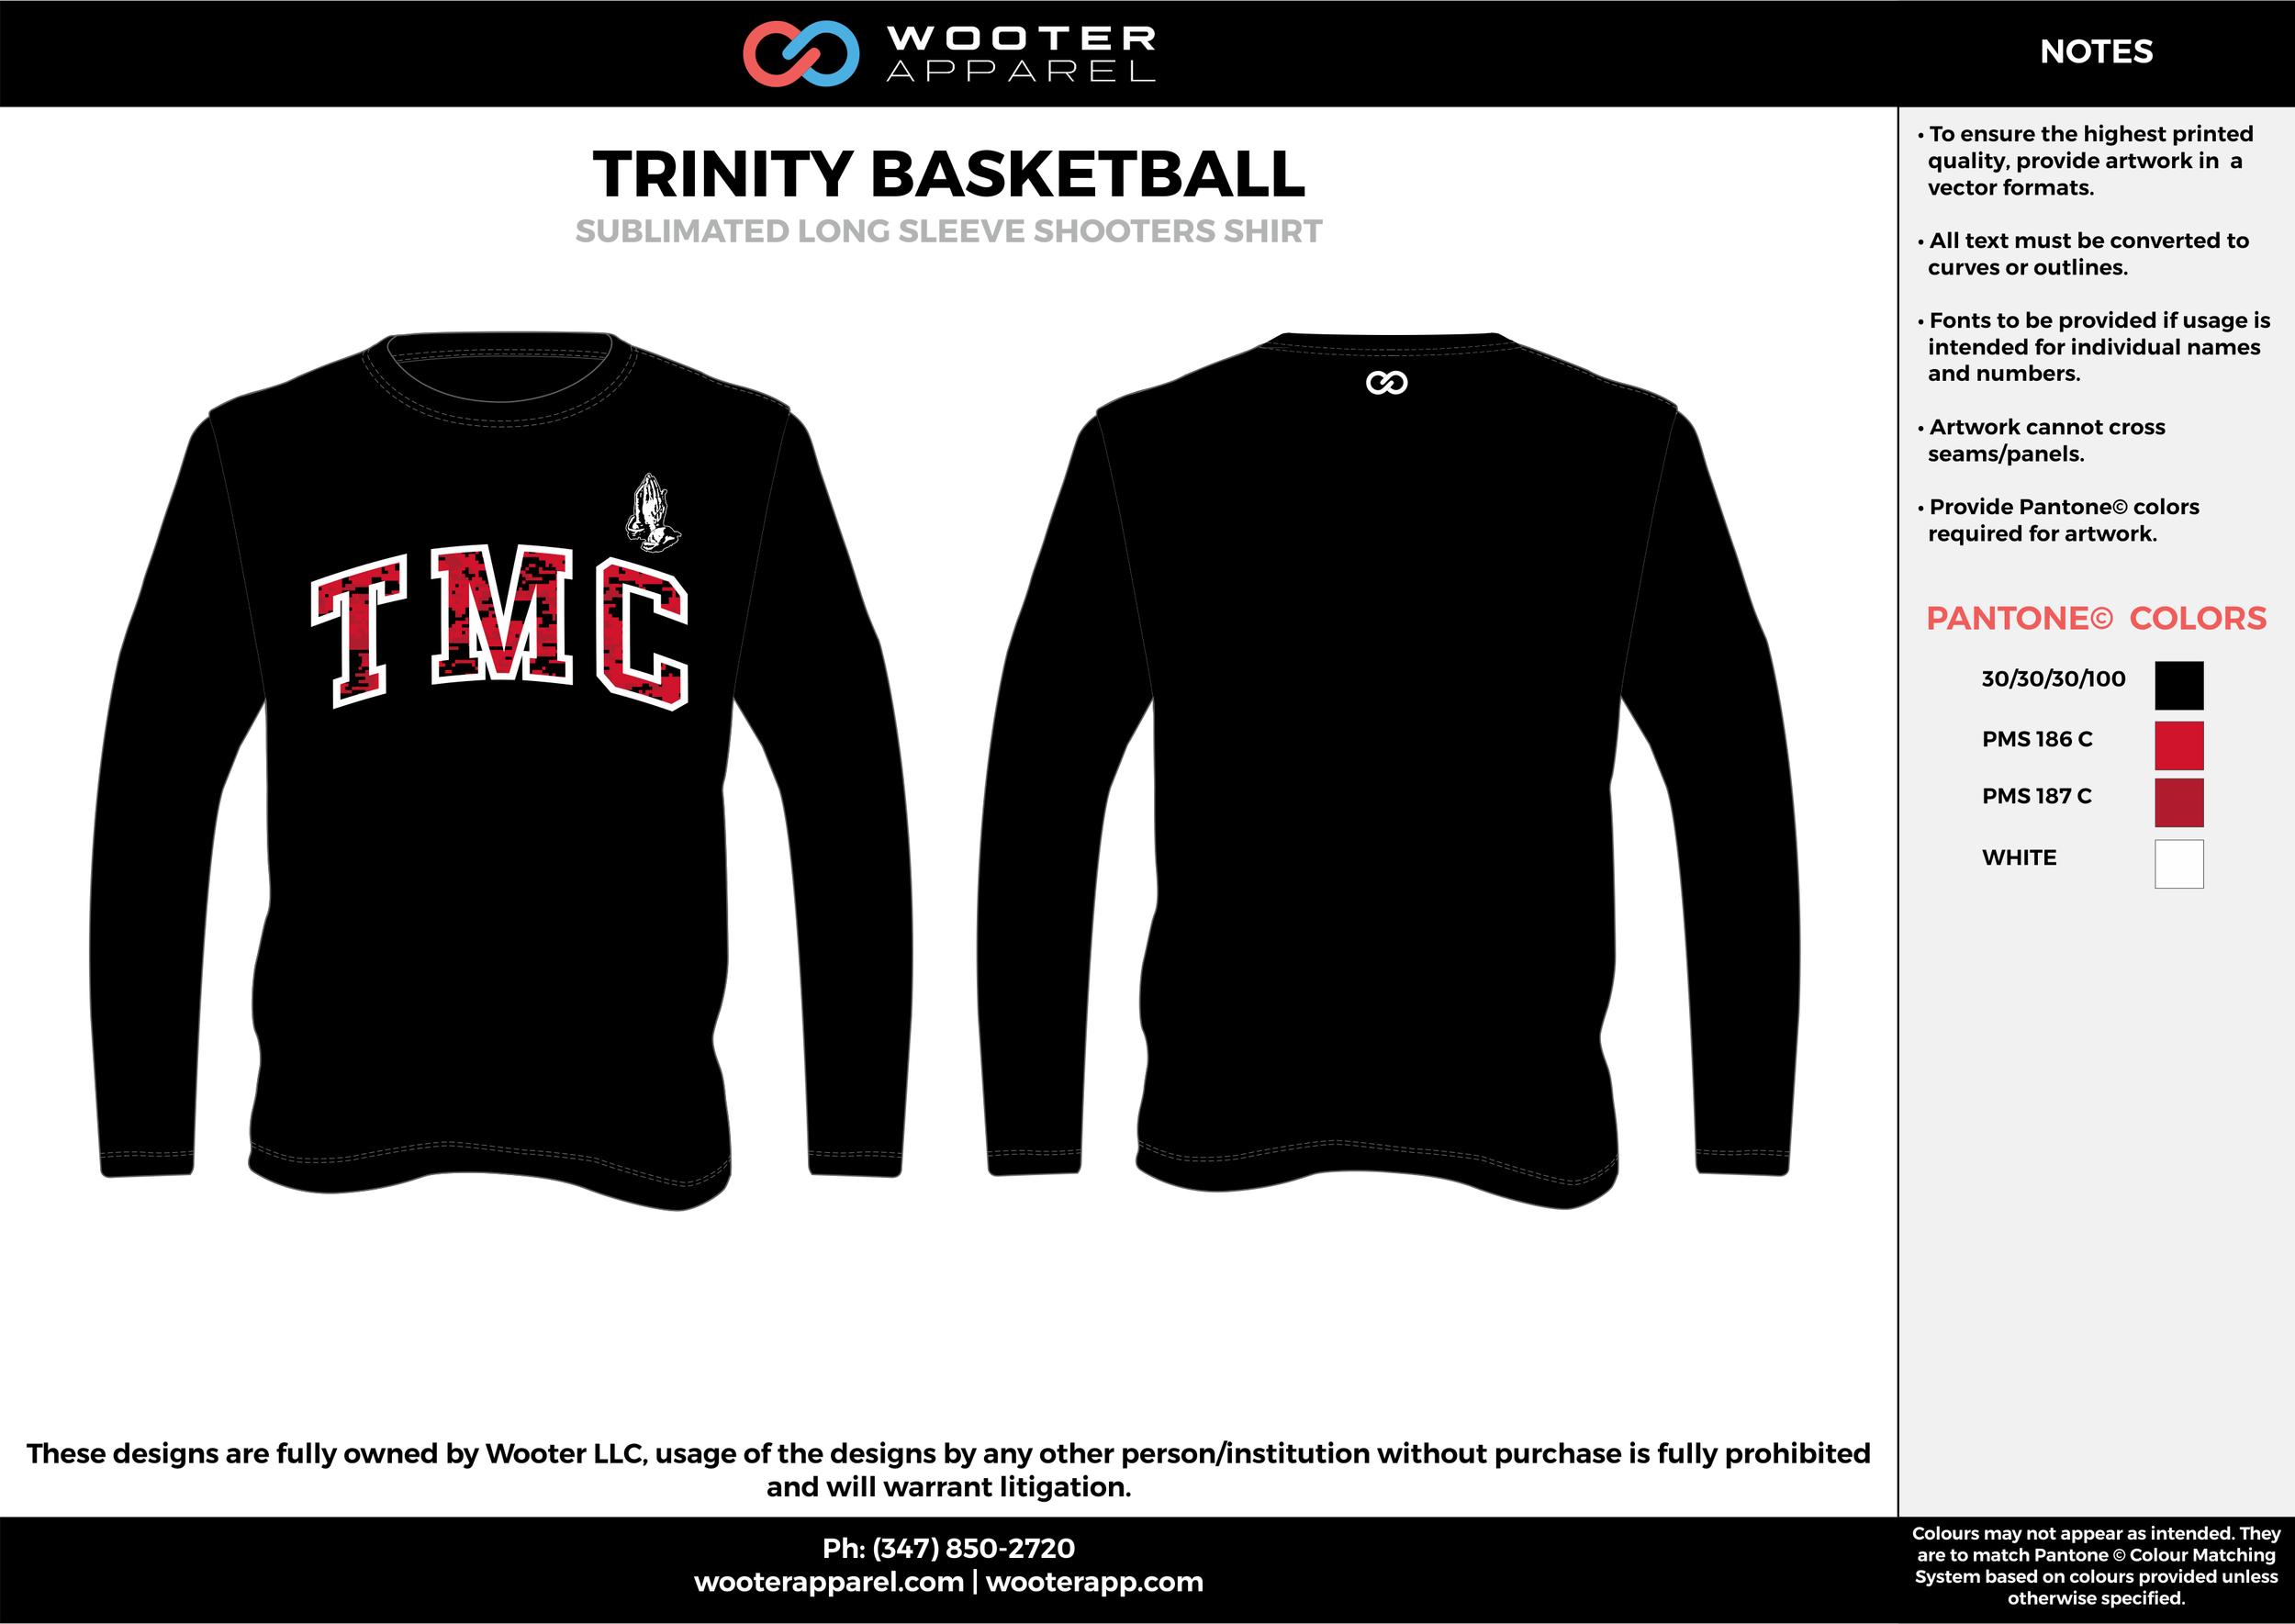 TRINITY BASKETBALL black red white Basketball Long Sleeve Shooting Shirt